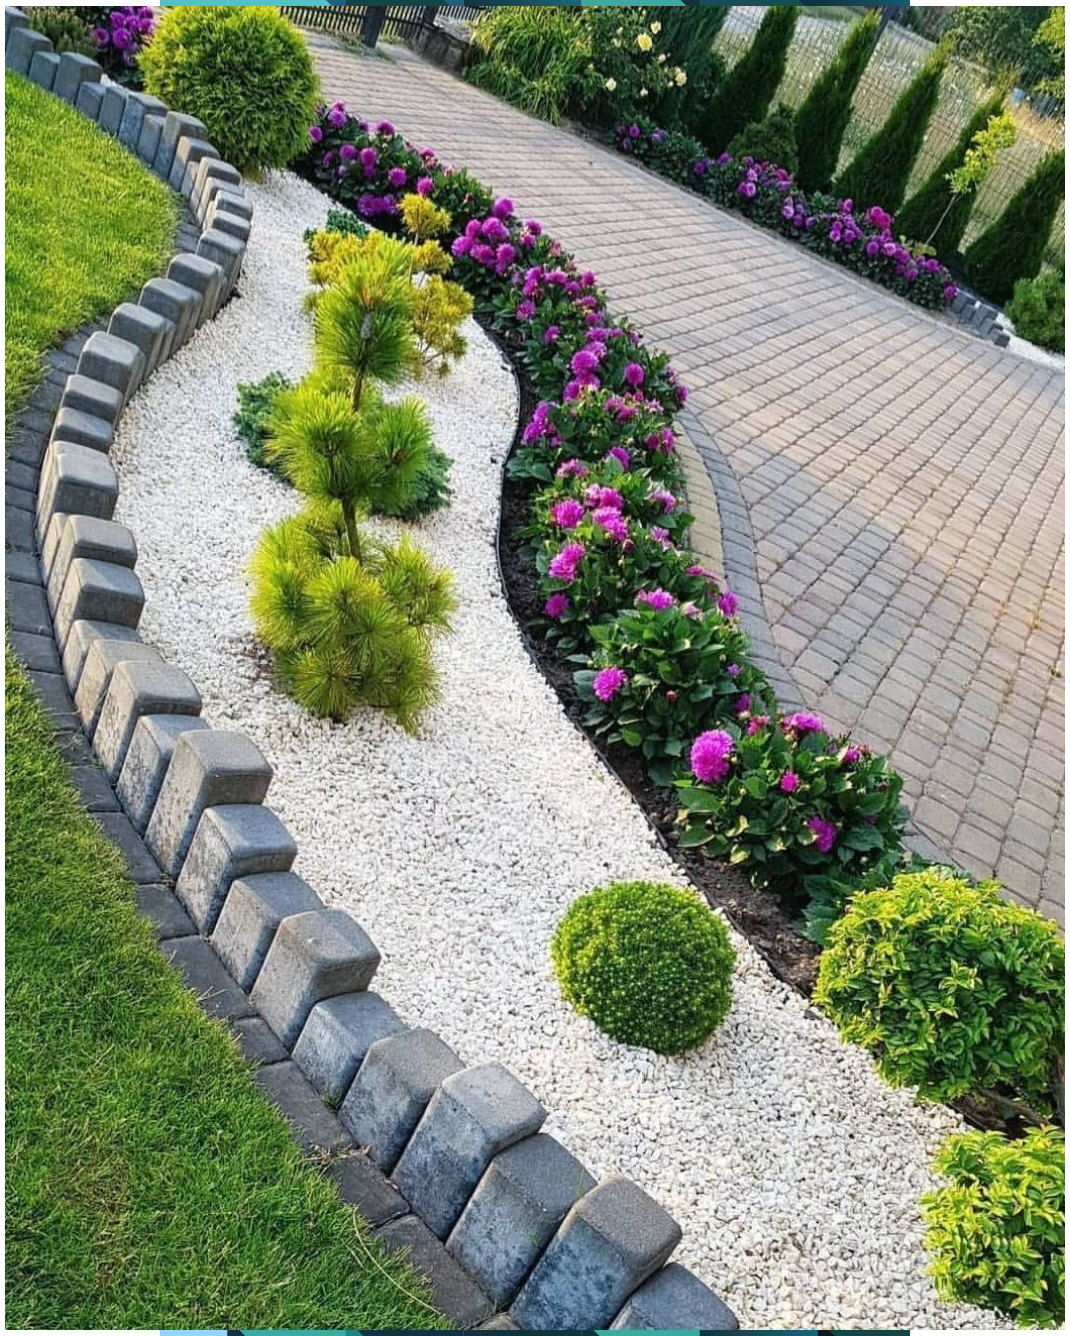 Best 15 Backyard Designs Ideas And Projects Backyard Beautiful Garden Designs Garden B In 2020 Courtyard Landscaping Easy Landscaping Backyard Landscaping Designs